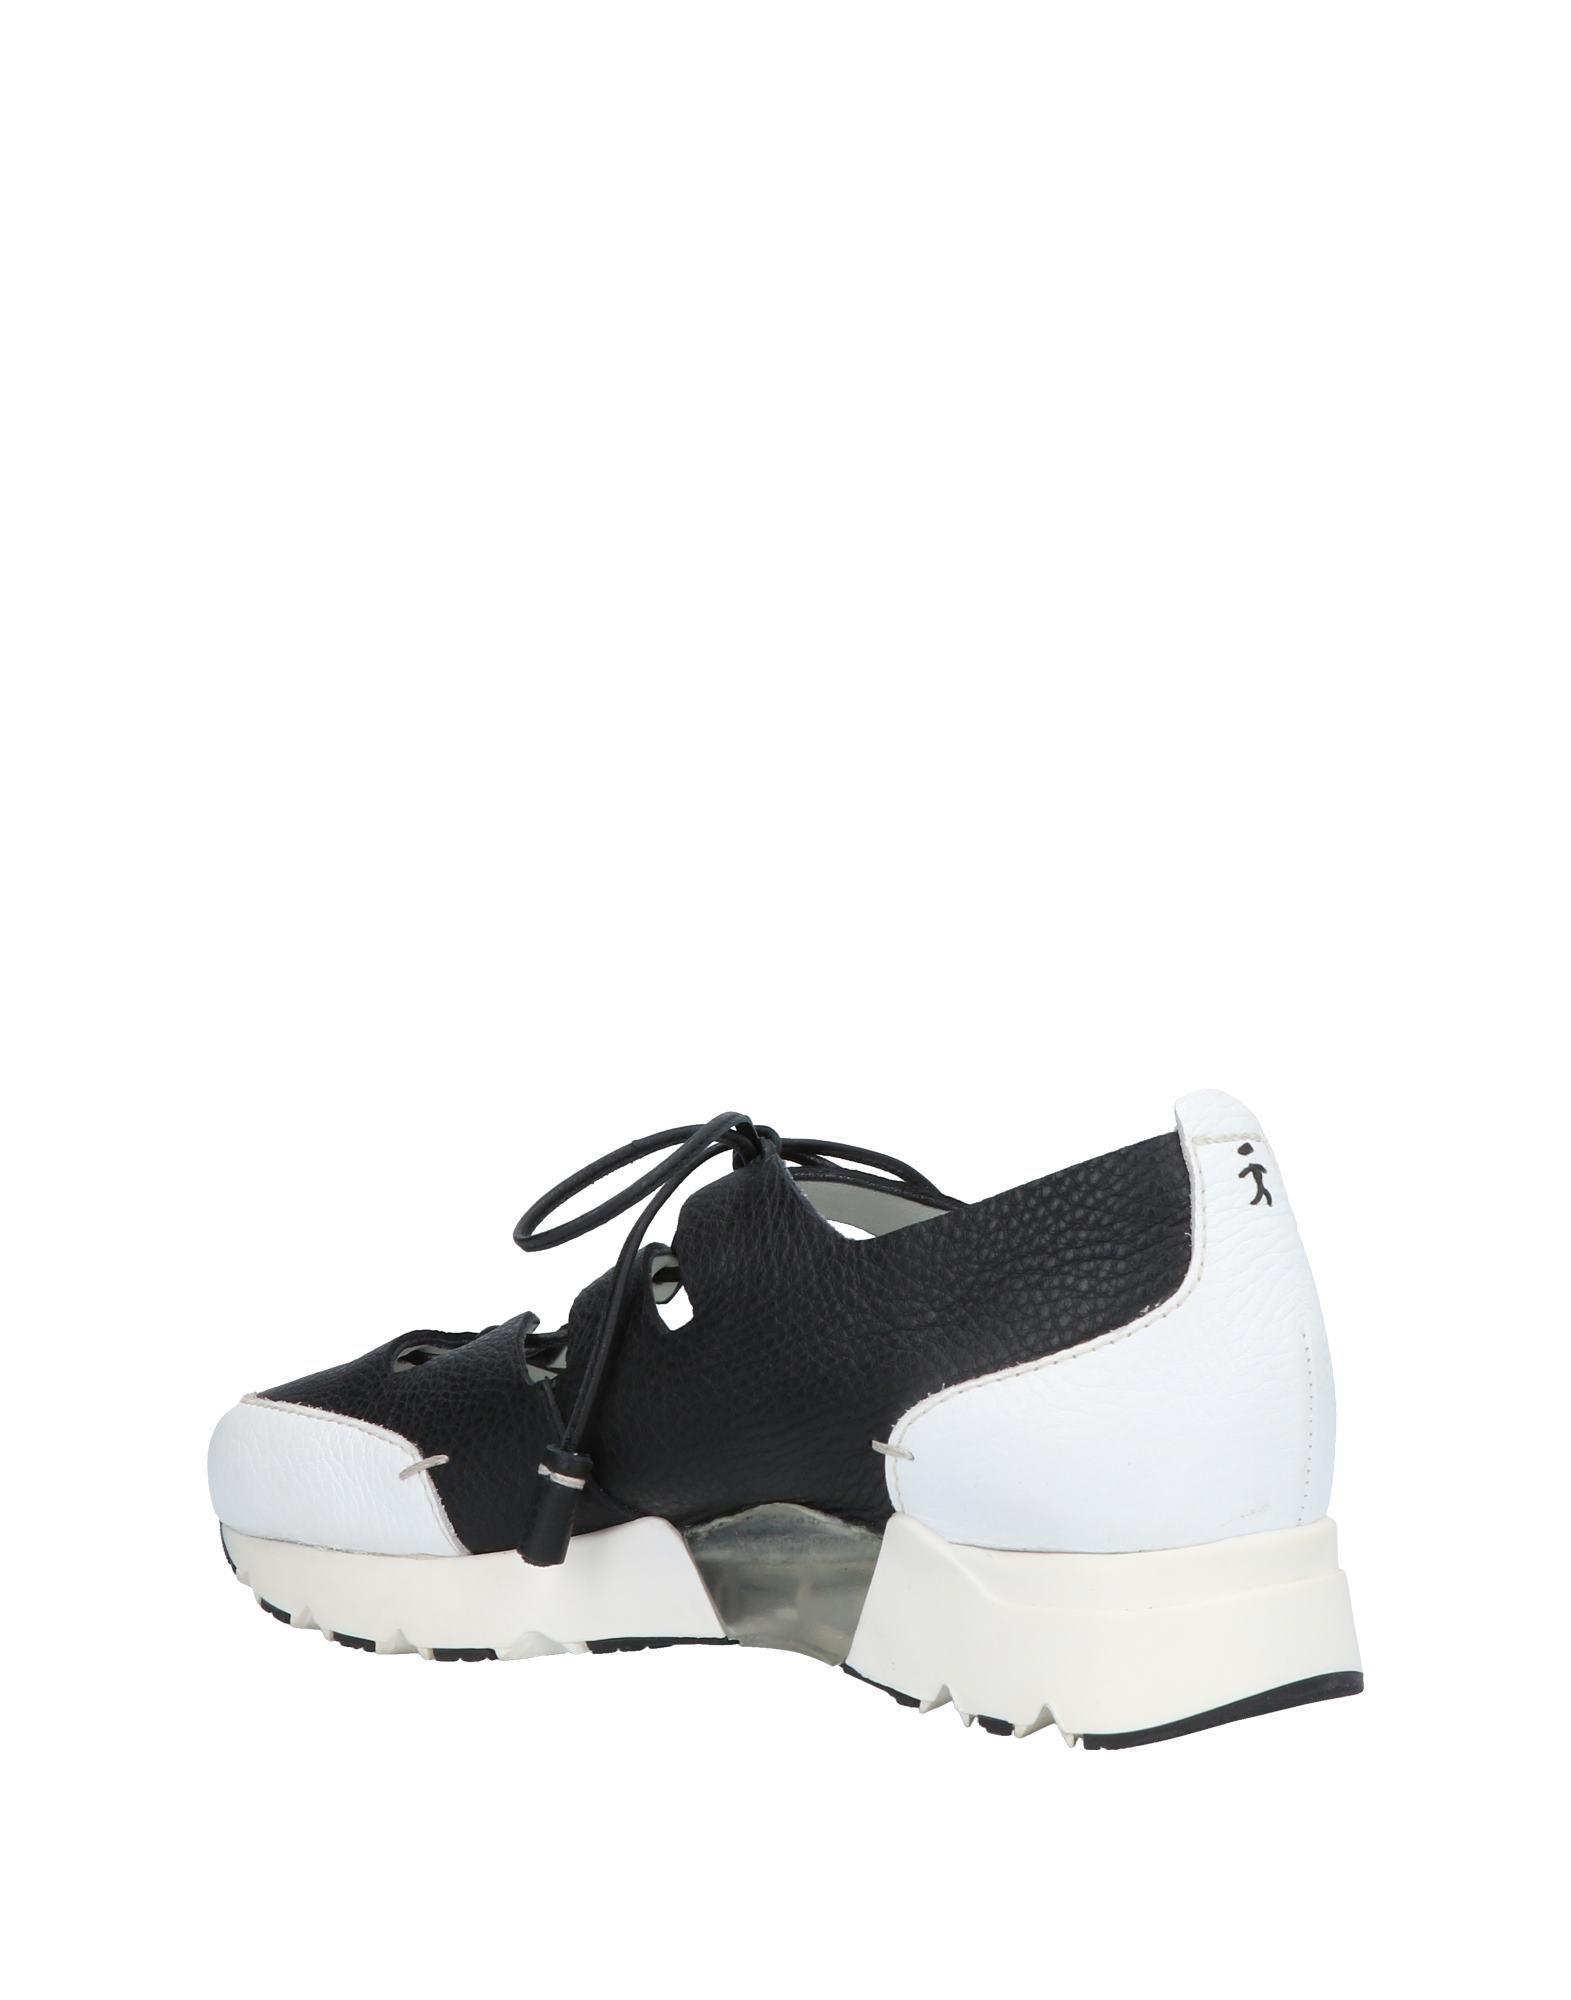 FOOTWEAR - Low-tops & sneakers Henry Beguelin OqF98